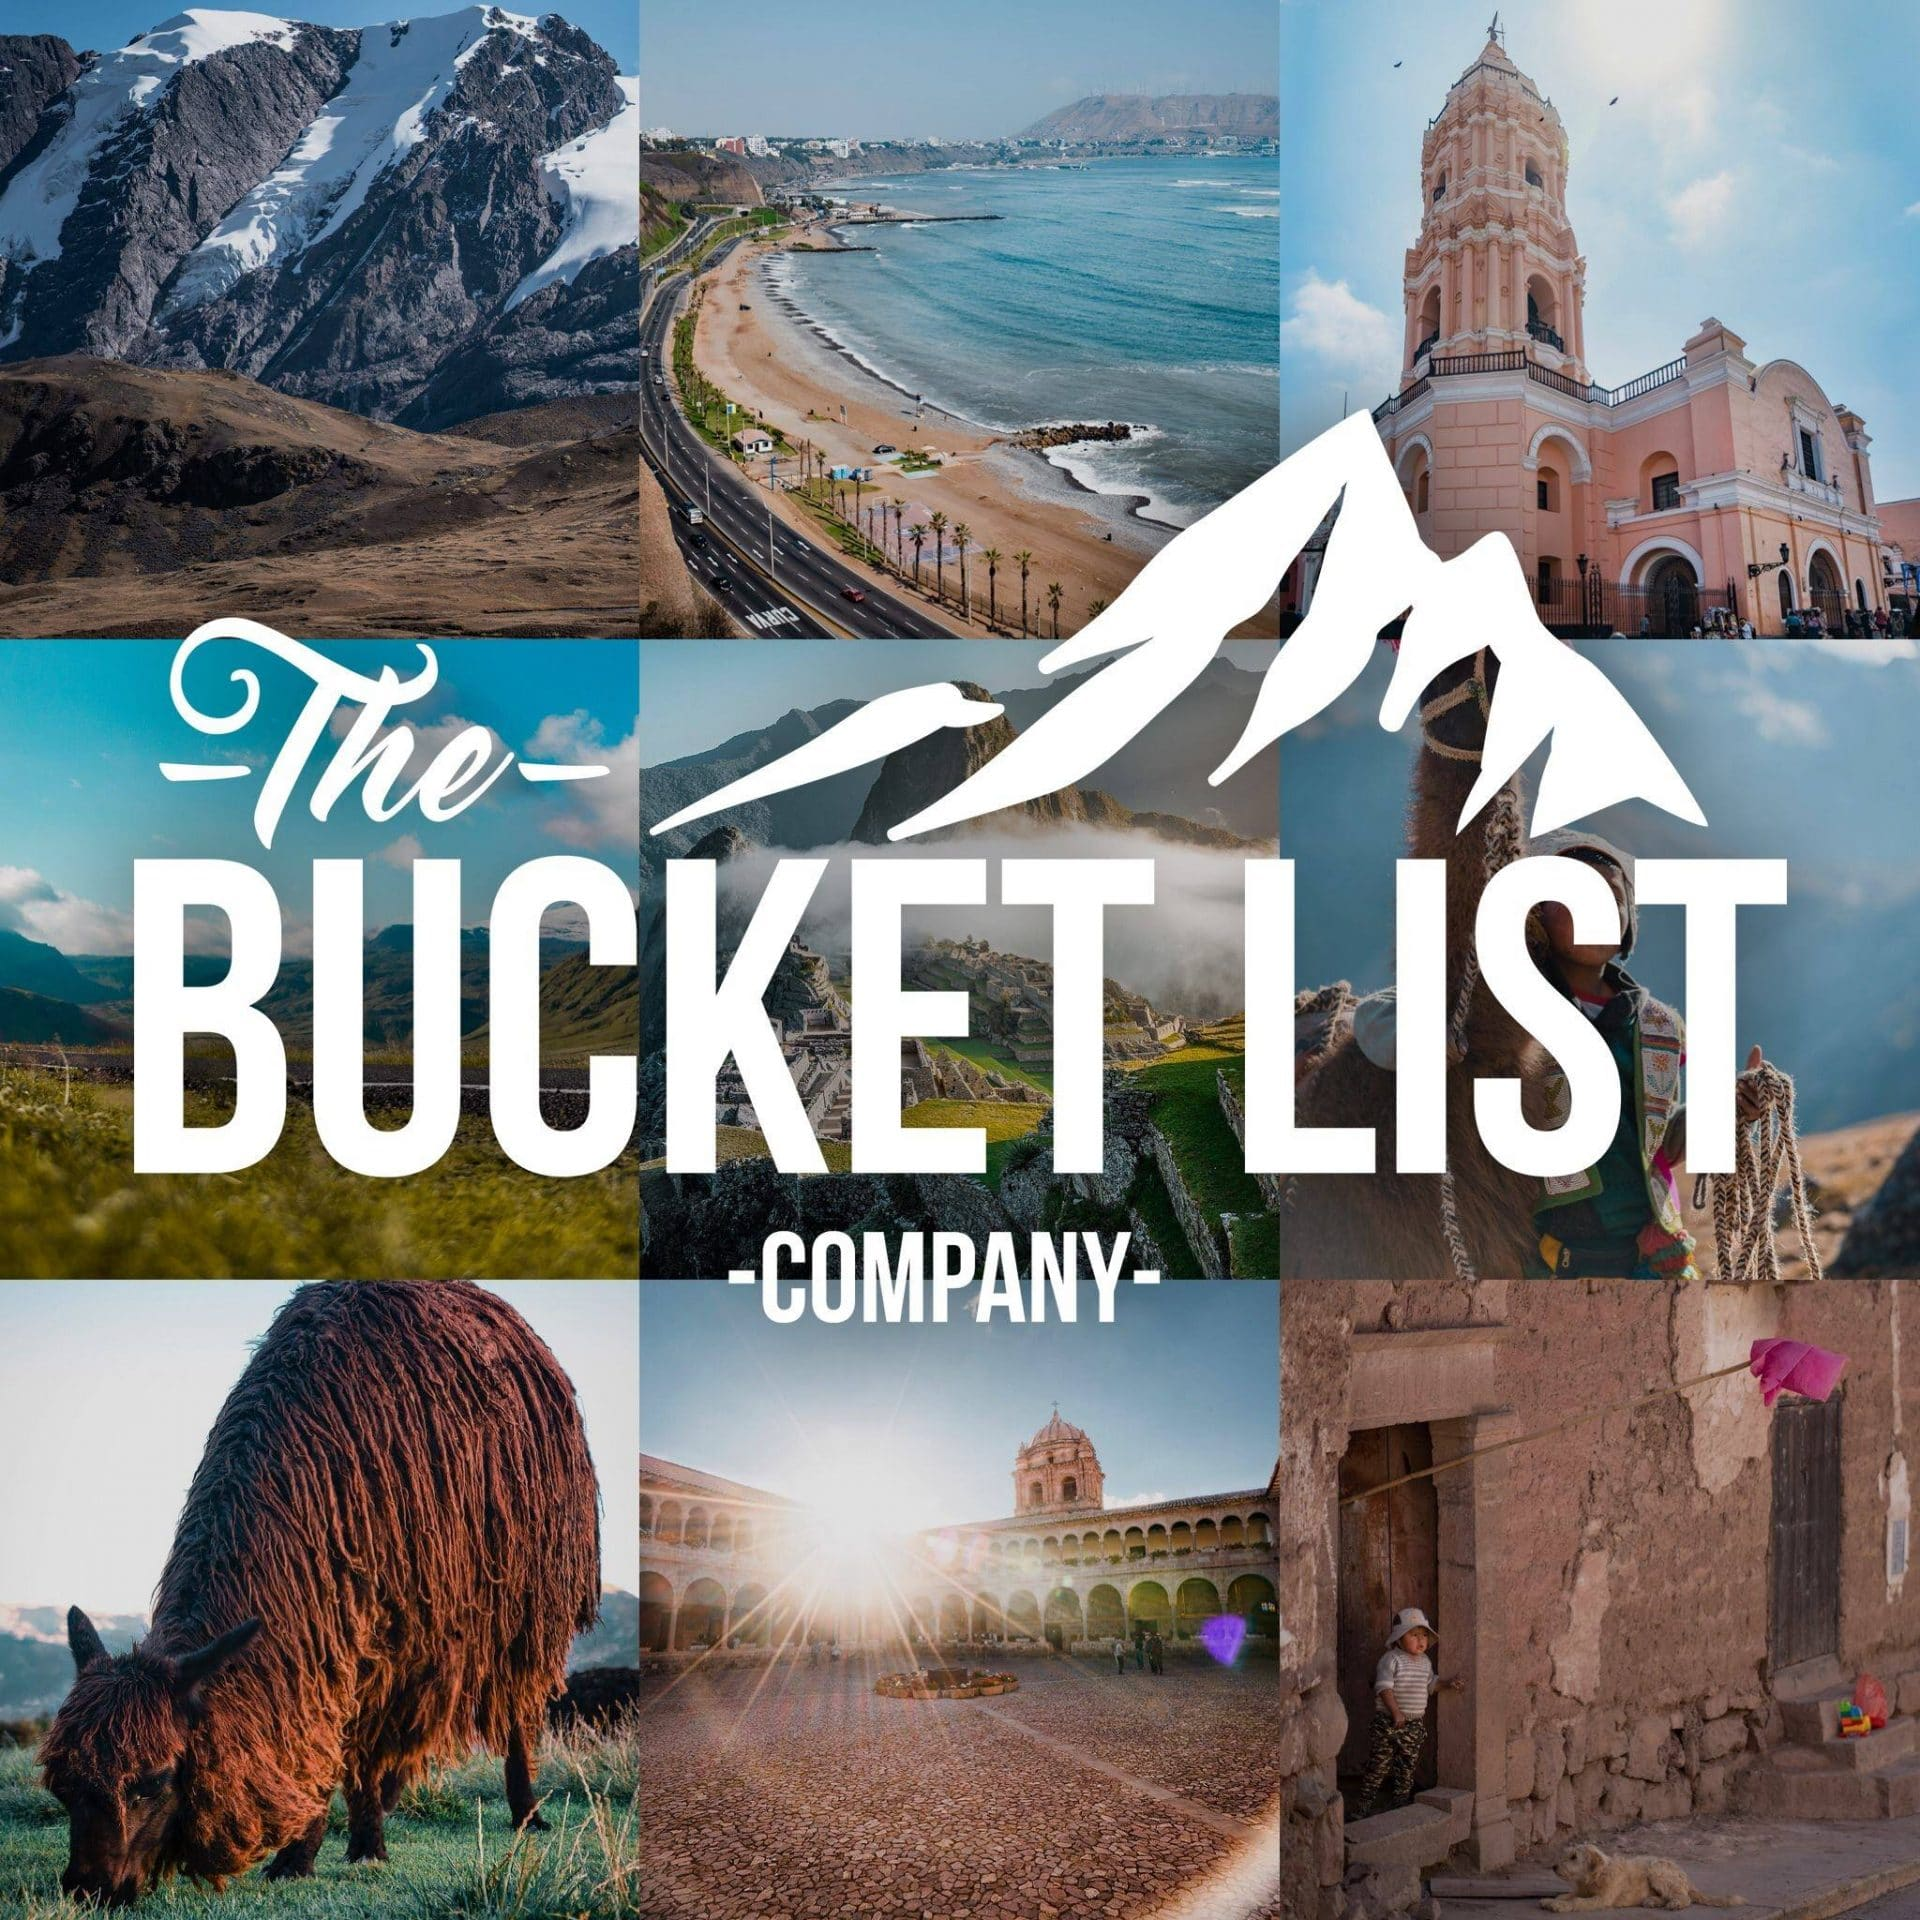 Adventure Bucket List Trips | The Bucket List Company